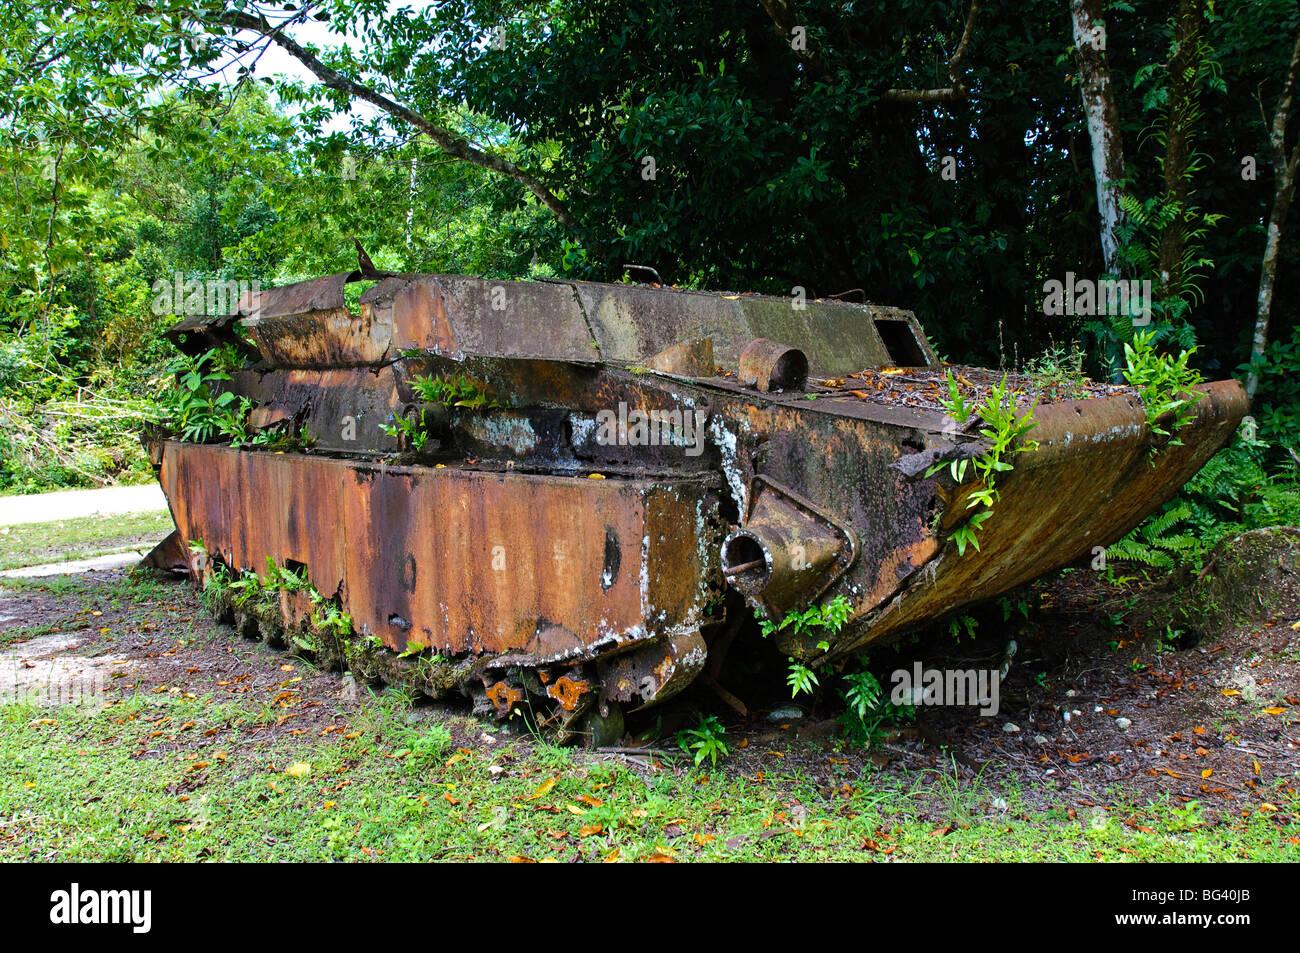 WWI landing craft wreckage, Peleliu, Republic of Palau, Pacific - Stock Image